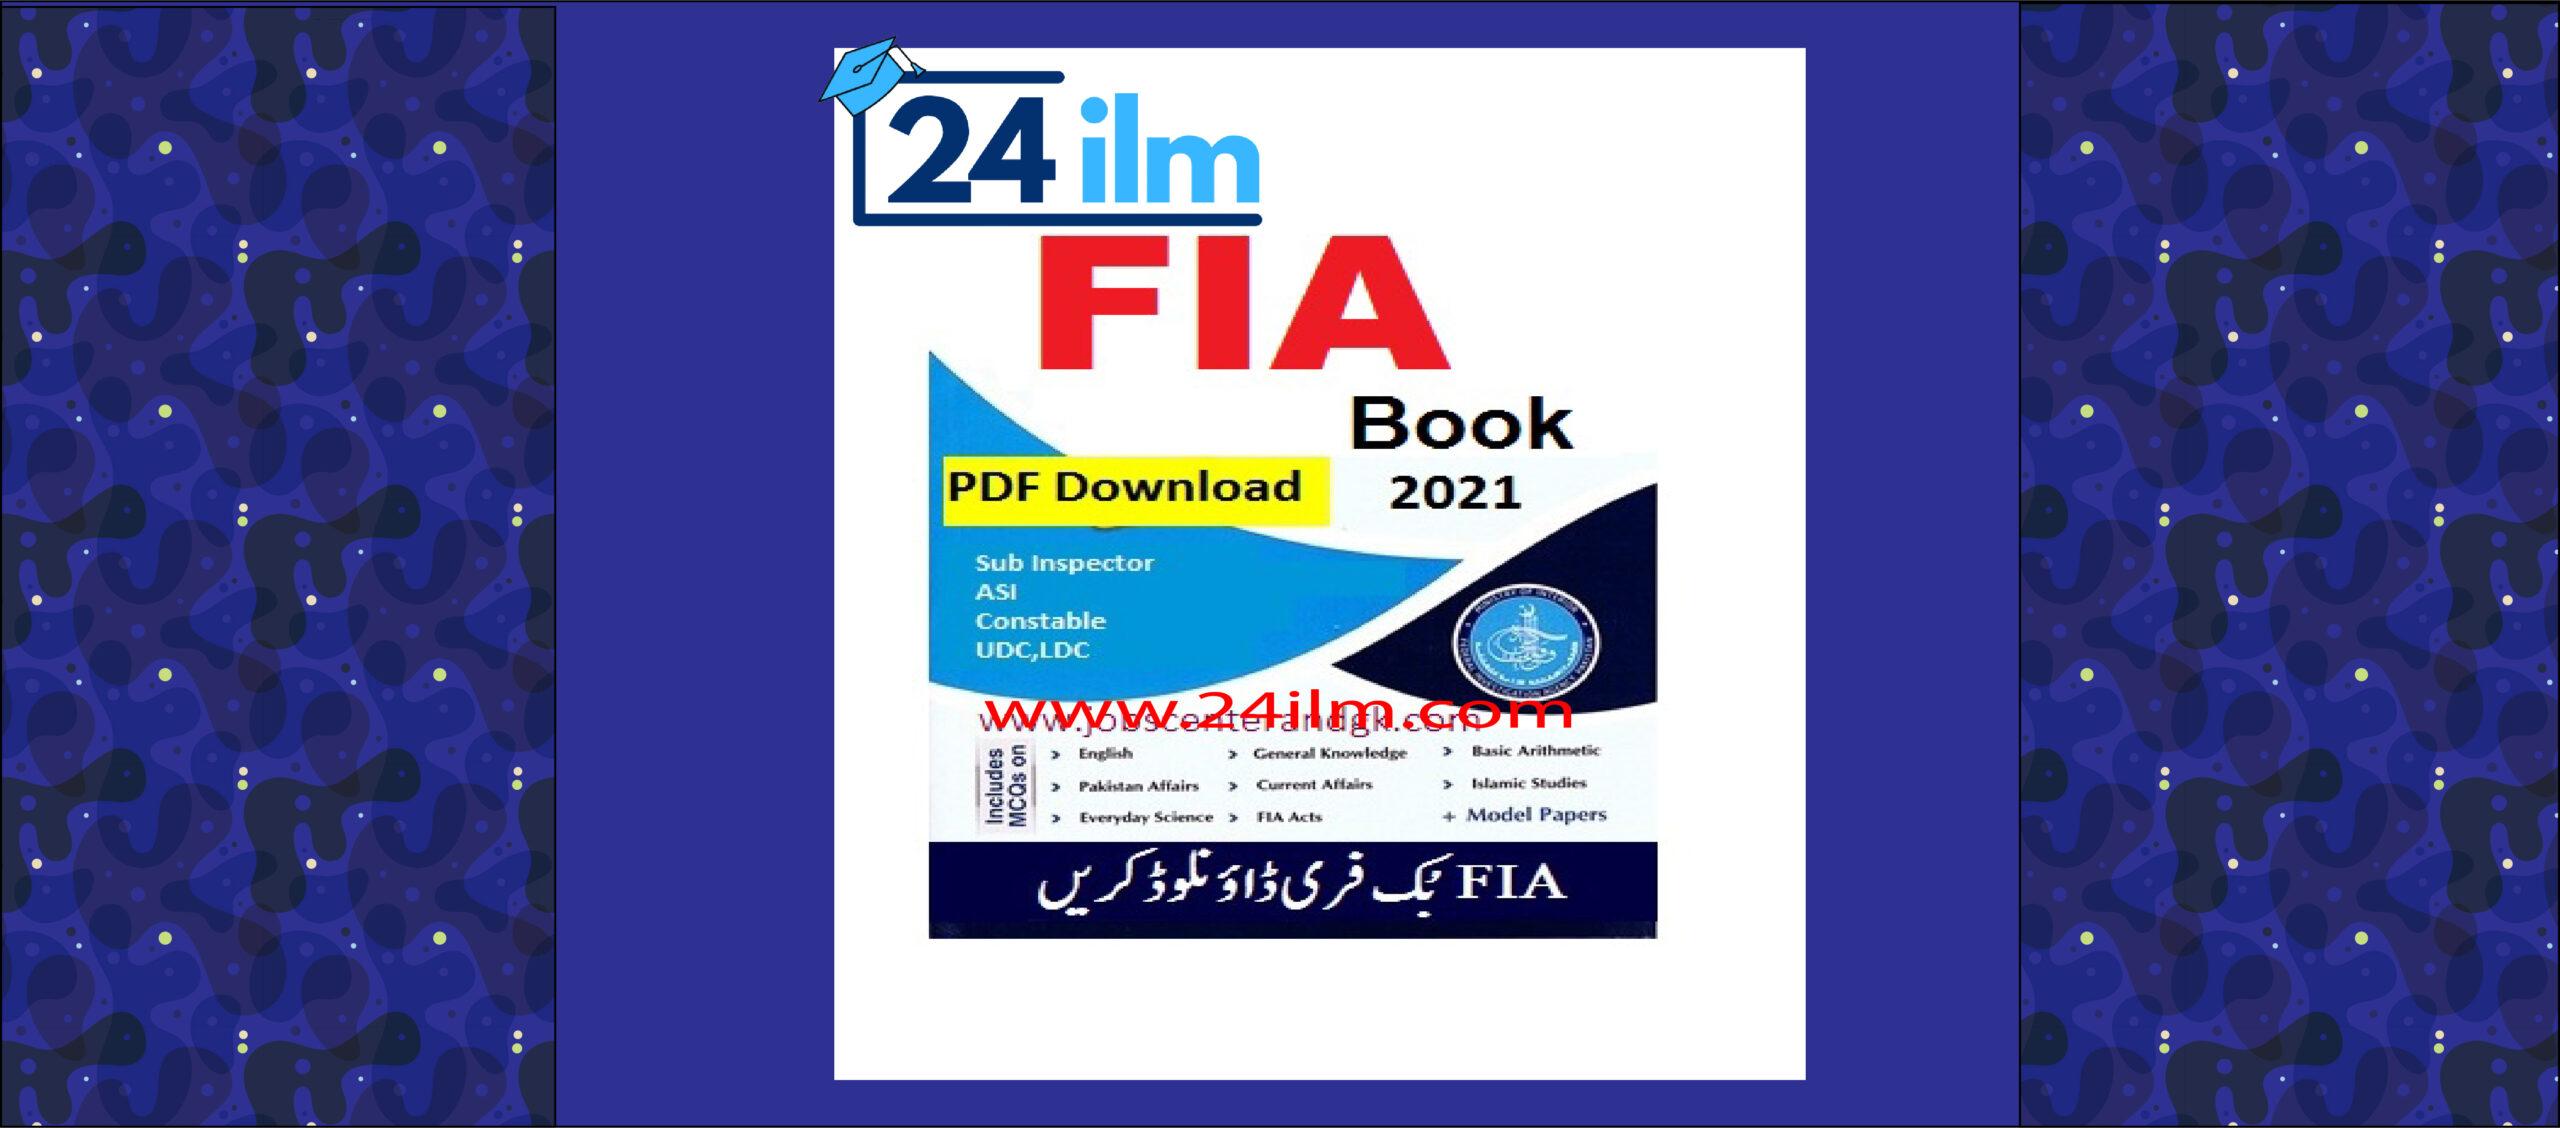 FIA book for written test